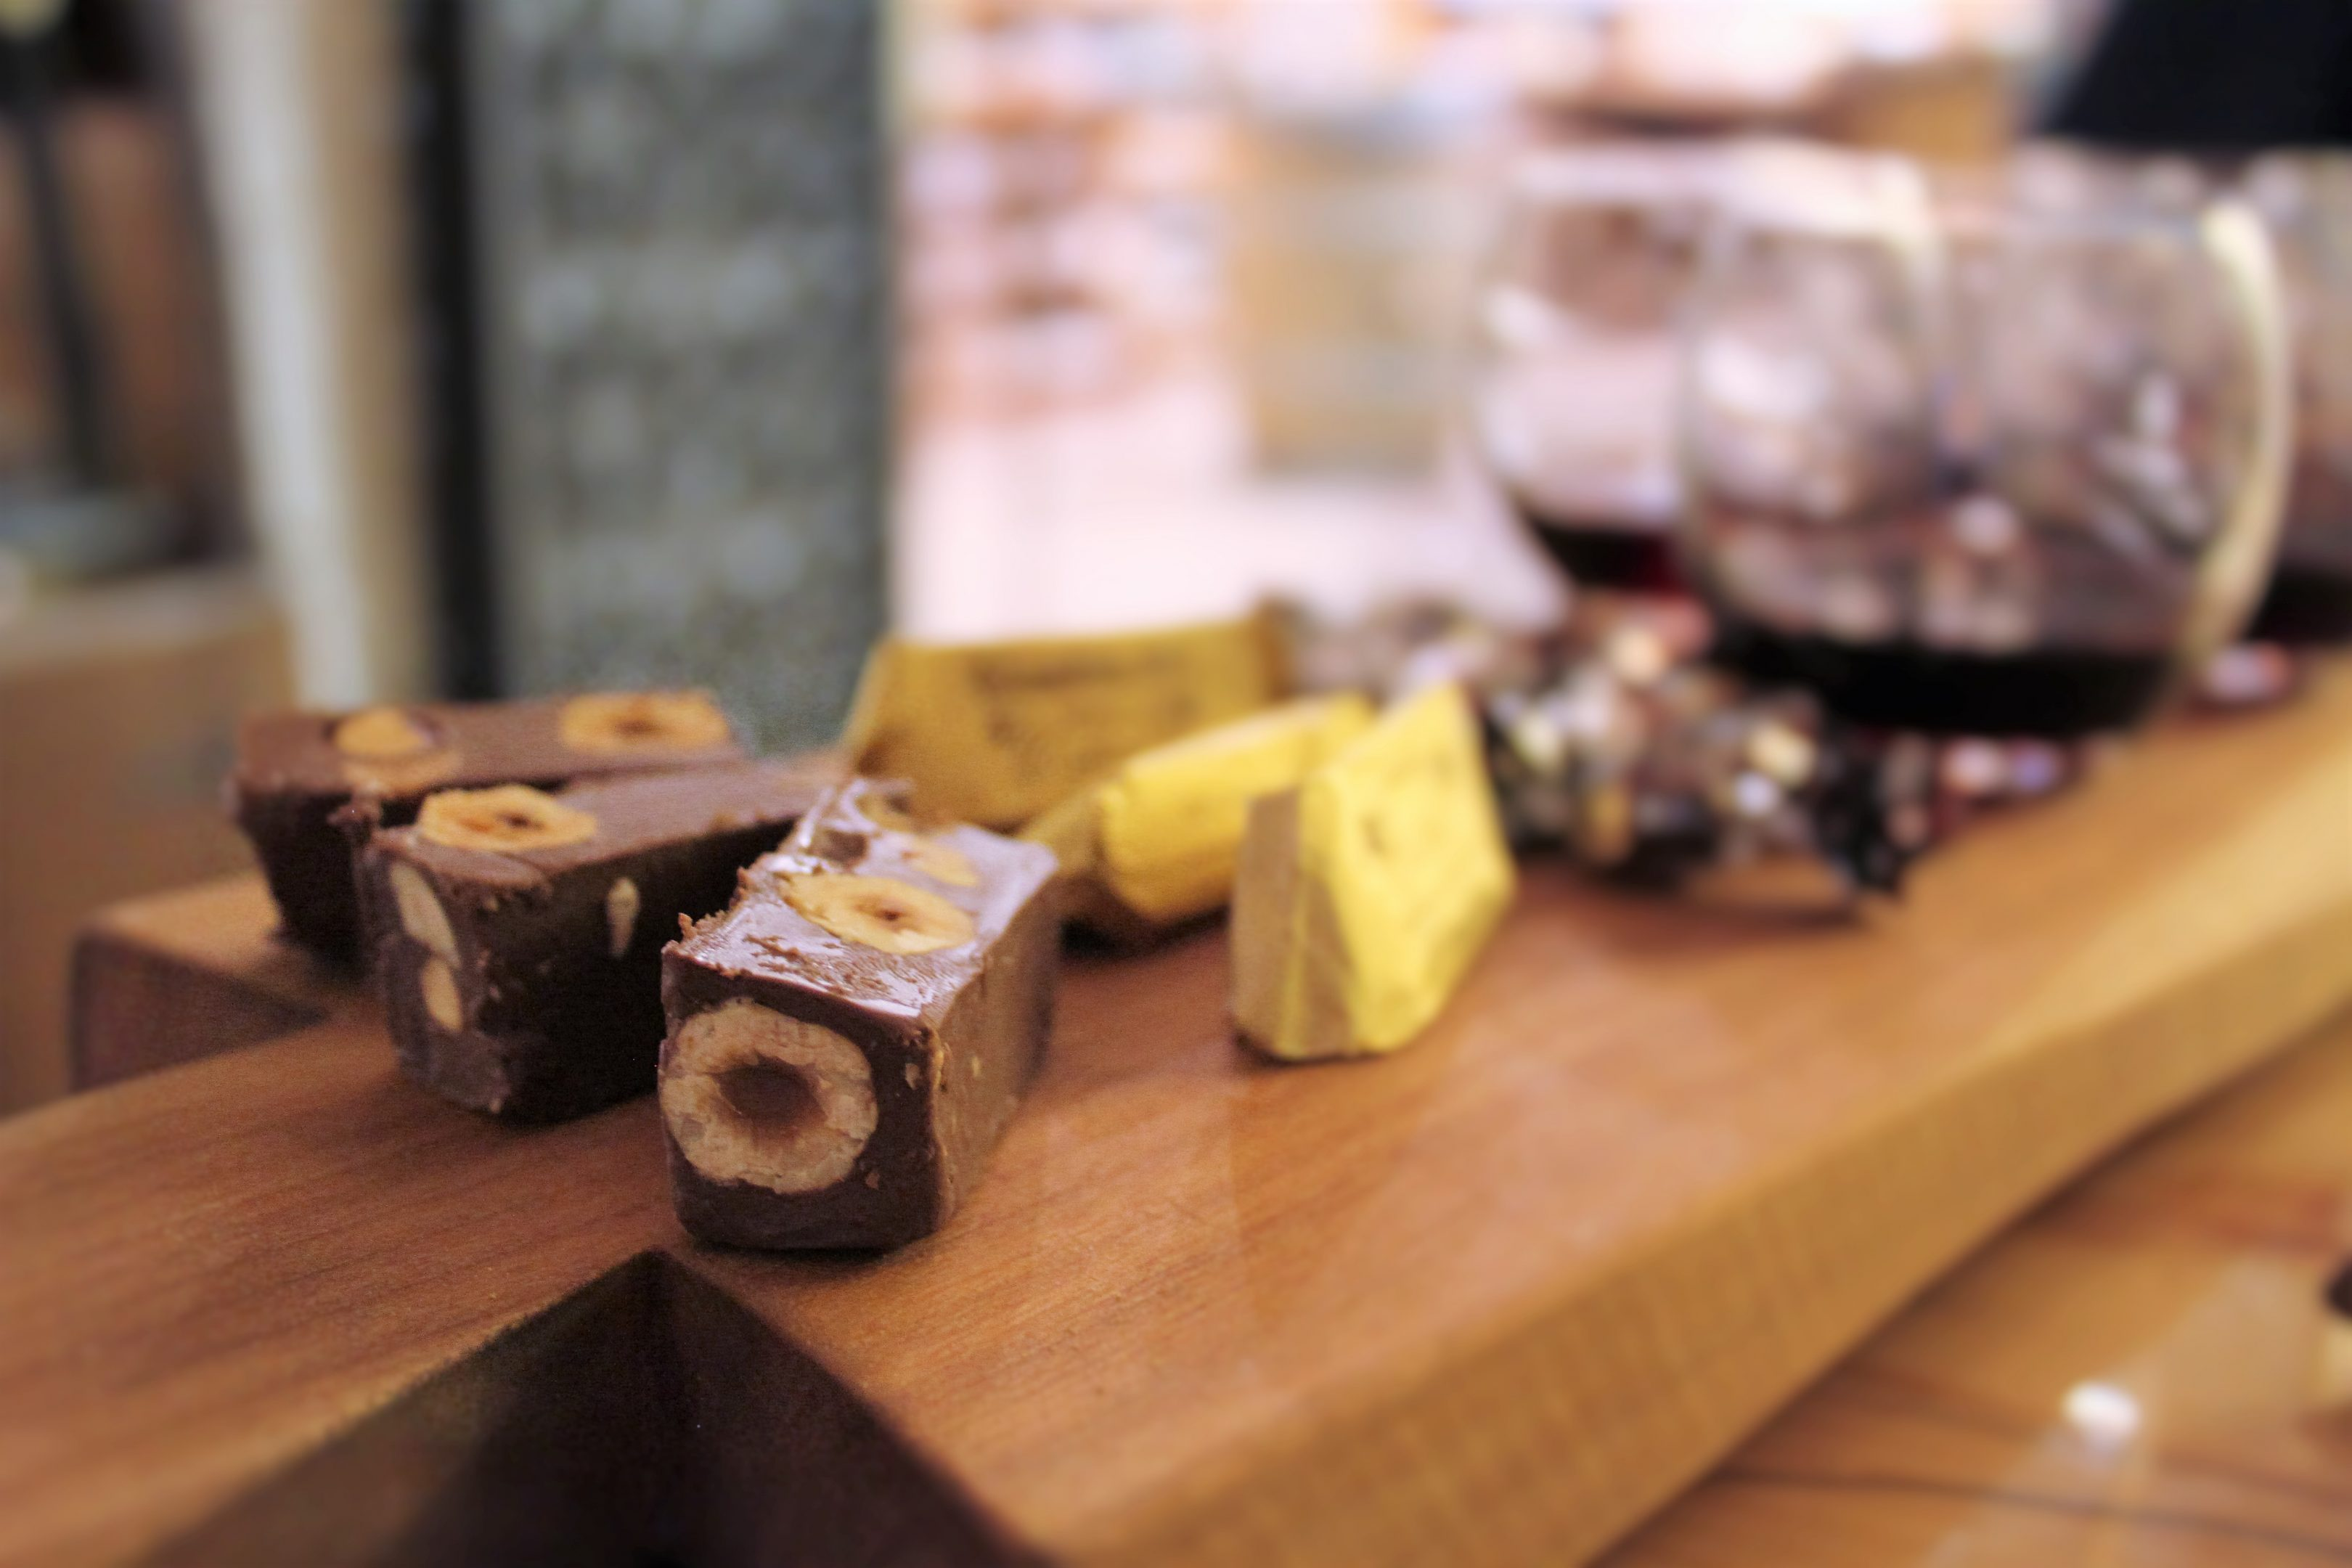 gianduja and chocolate wines